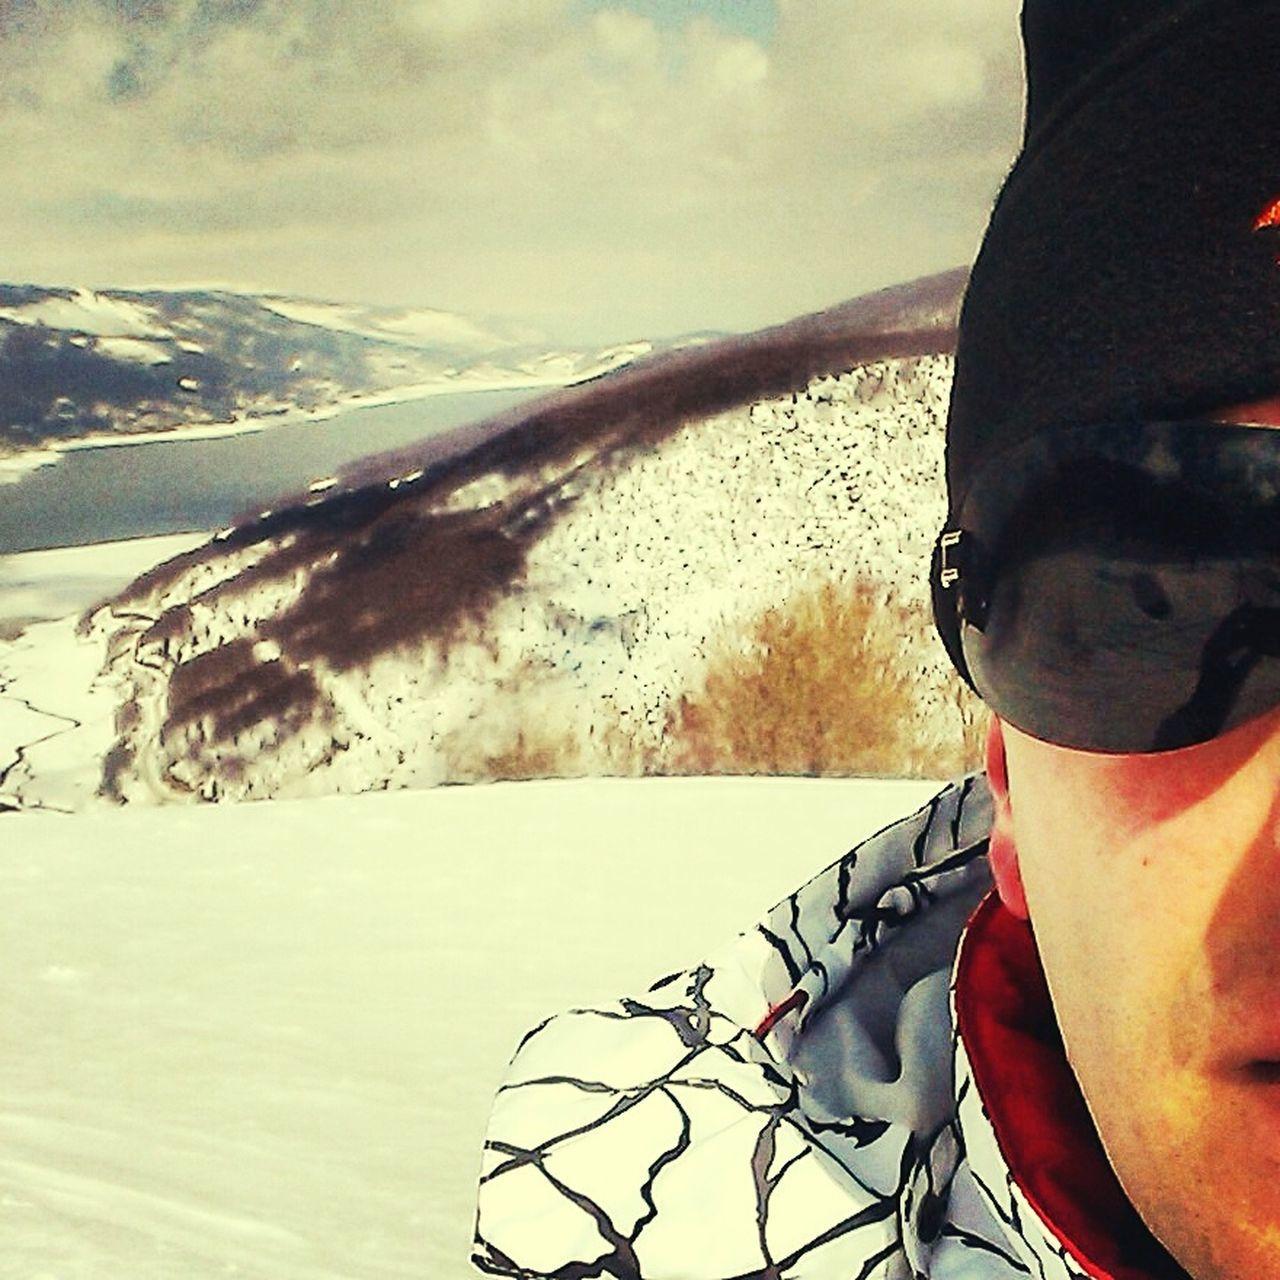 Selfie Me That's Me Wintersports Skiing Snow Macedonia Mavrovo Taking Photos Pictureoftheday